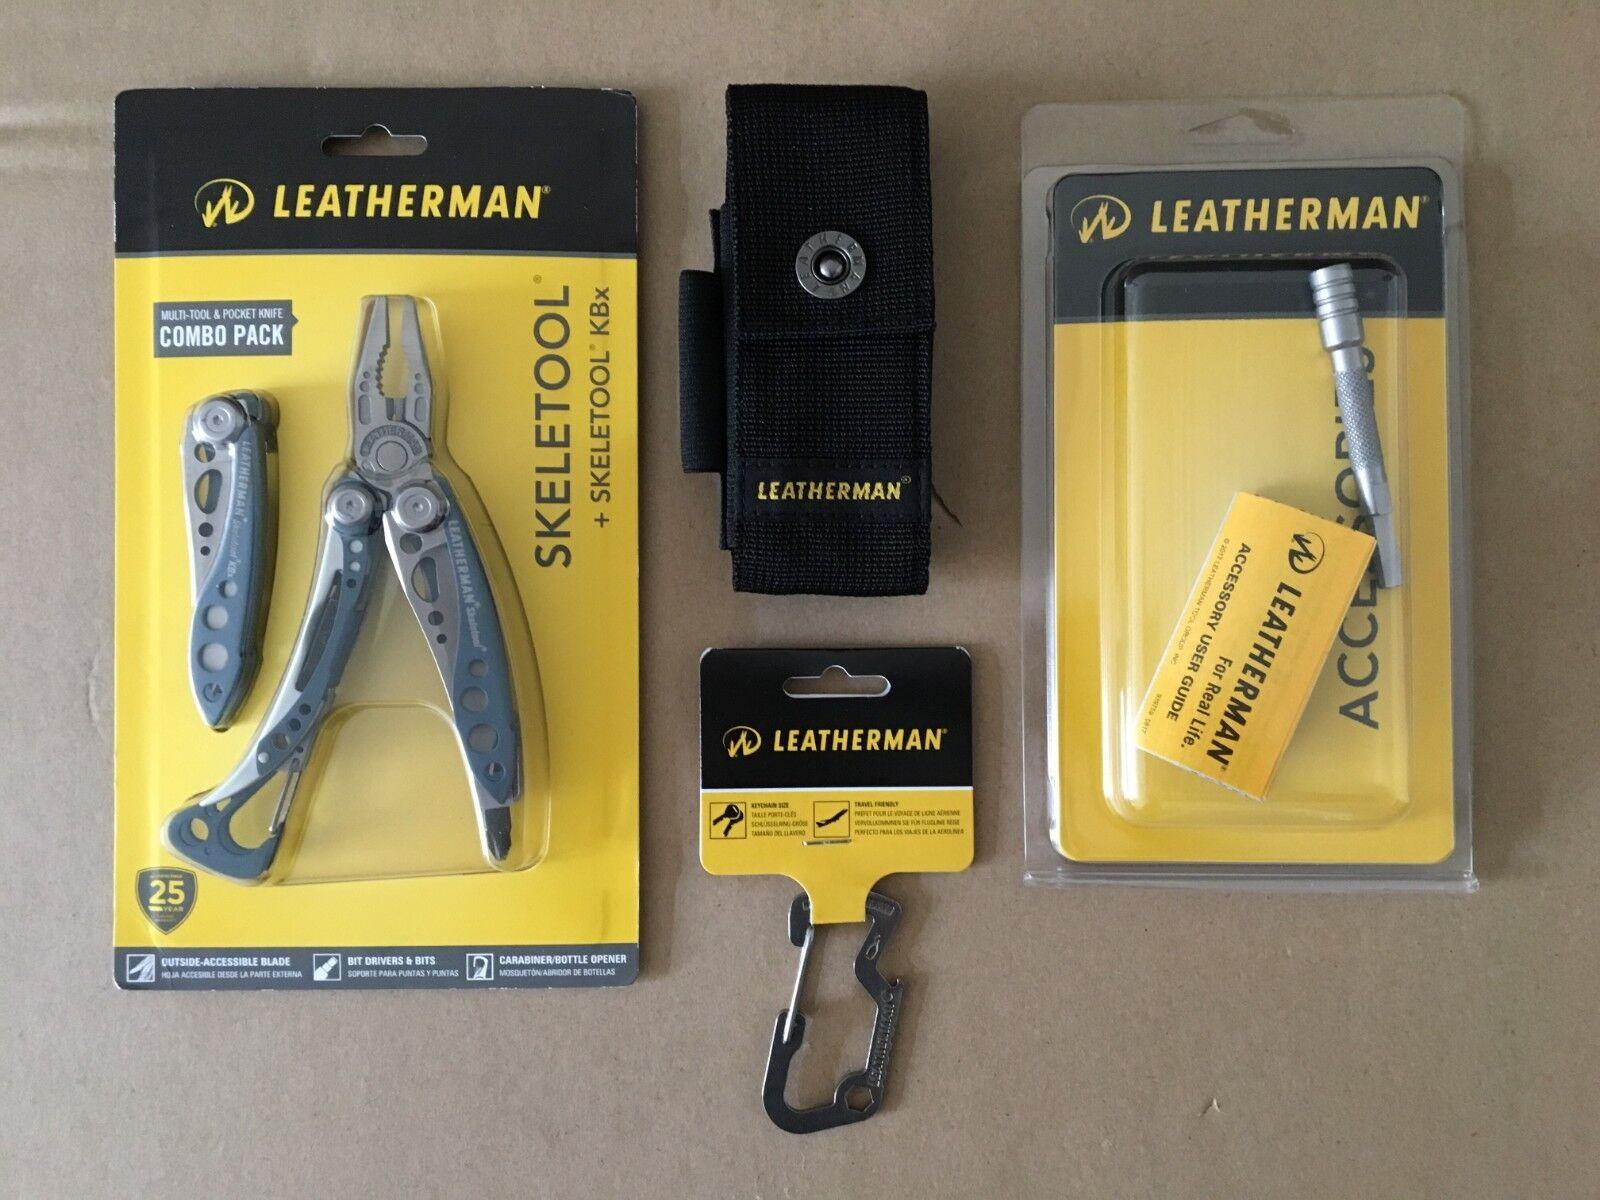 Leatherman Skeletool KBx832444 Combo bluee+Sheath+Extender+ Carabiner Cap Lifter